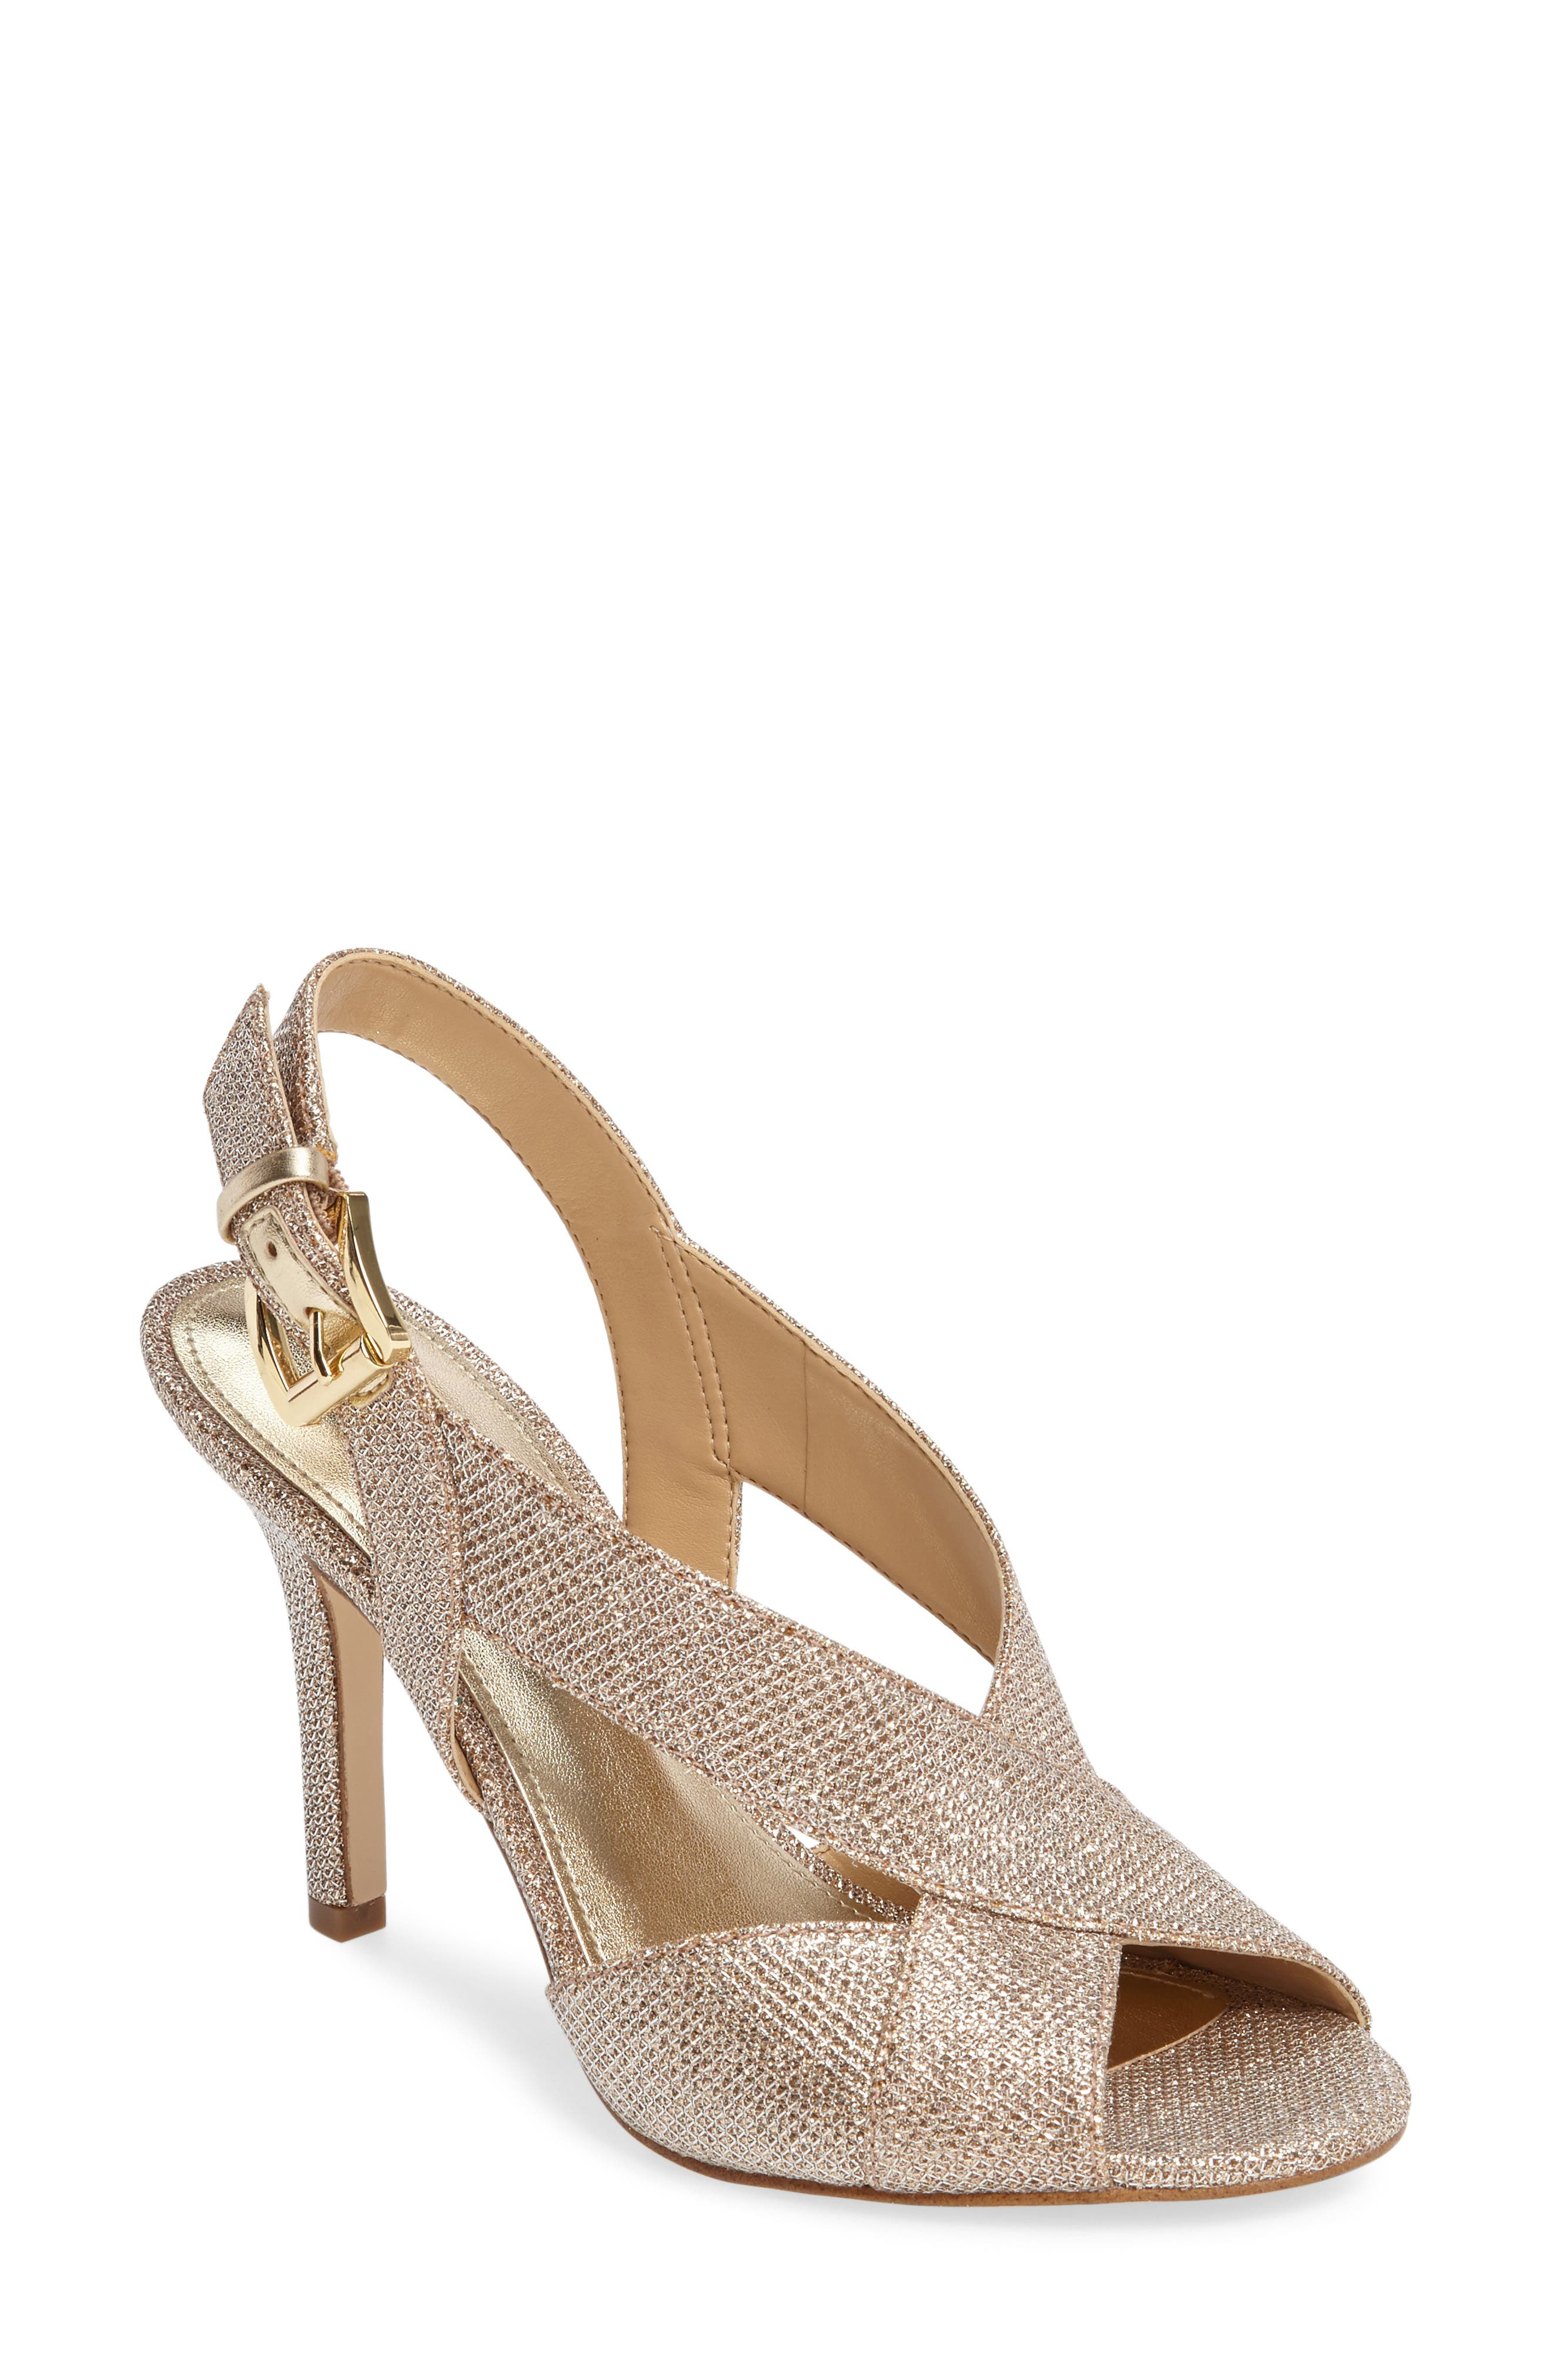 MICHAEL Michael Kors Wedding Shoes Nordstrom